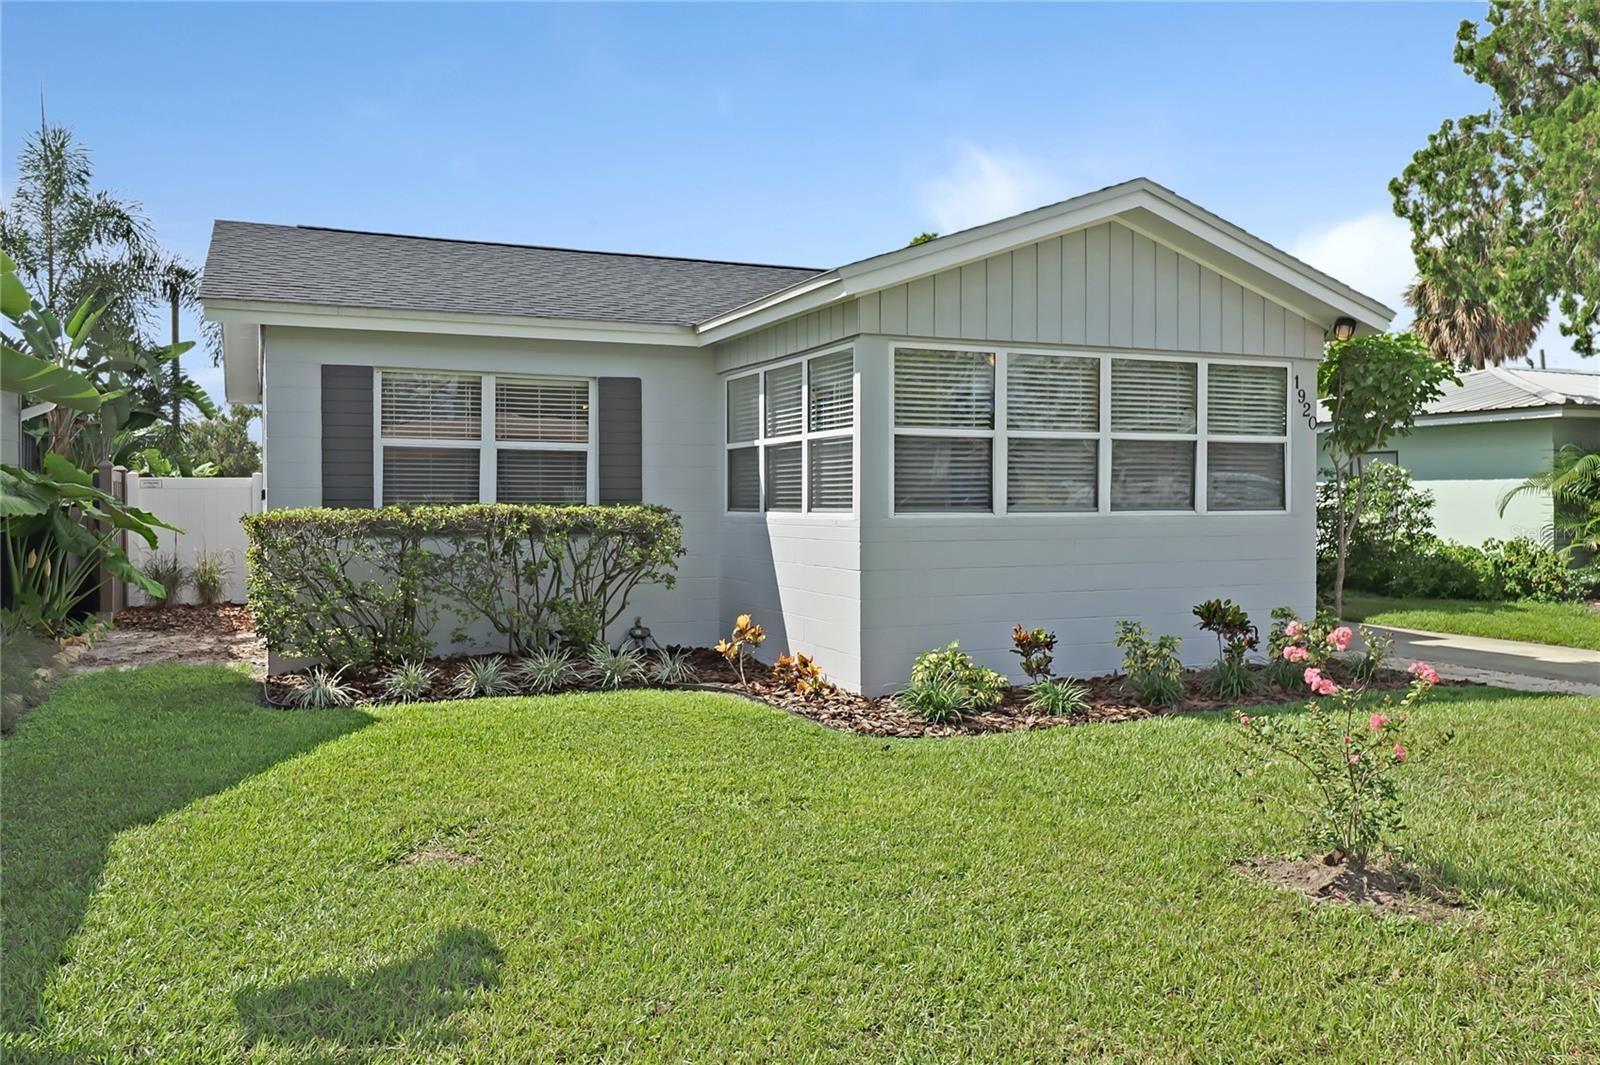 1920 OGLESBY AVENUE, Winter Park, FL 32789 - #: O5973812